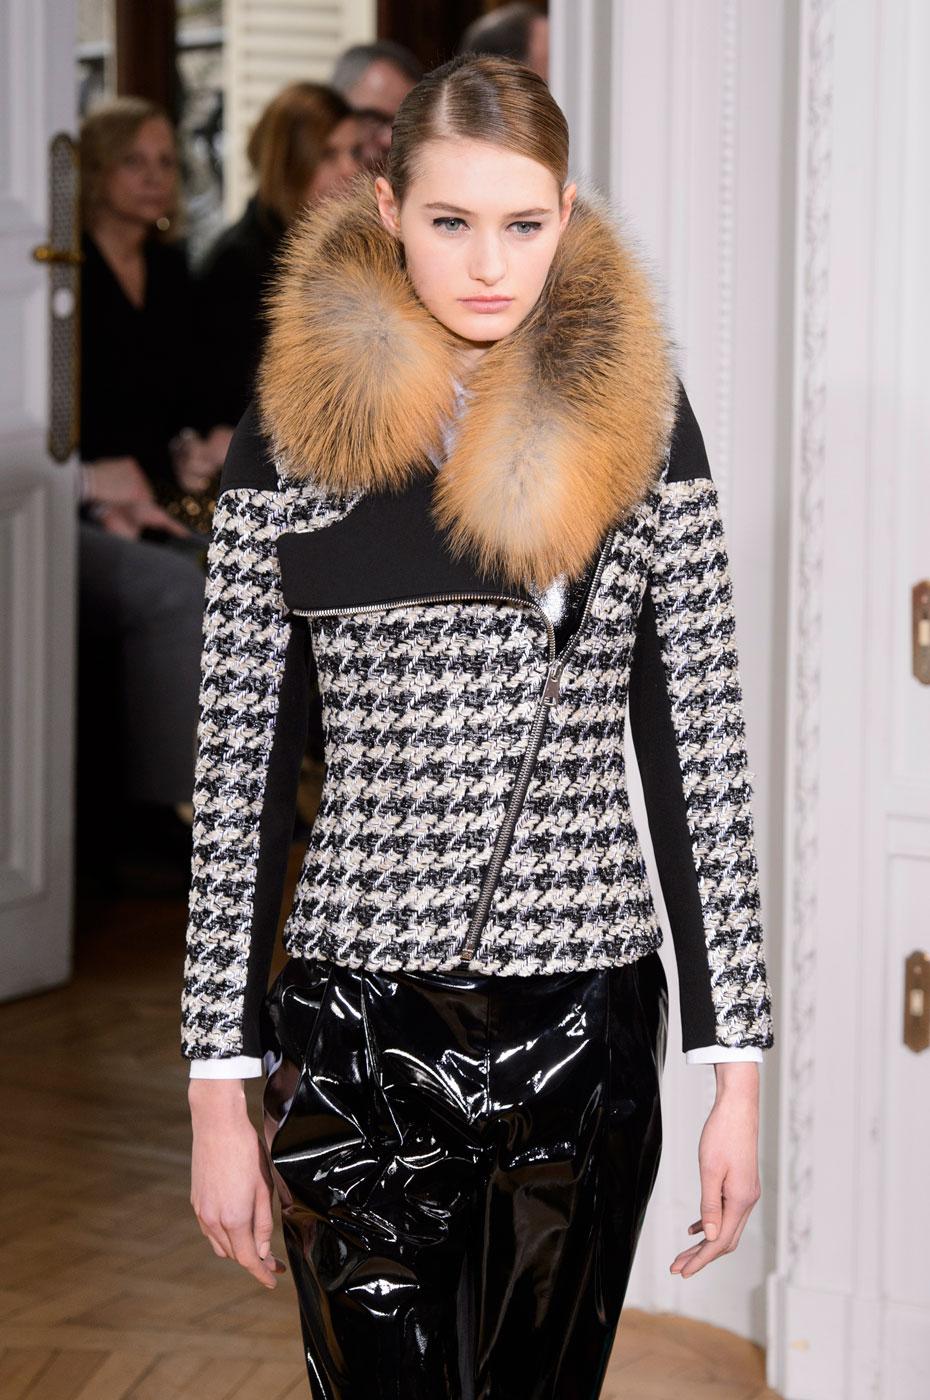 Bouchra-Jarrar-fashion-runway-show-haute-couture-paris-spring-summer-2015-the-impression-34